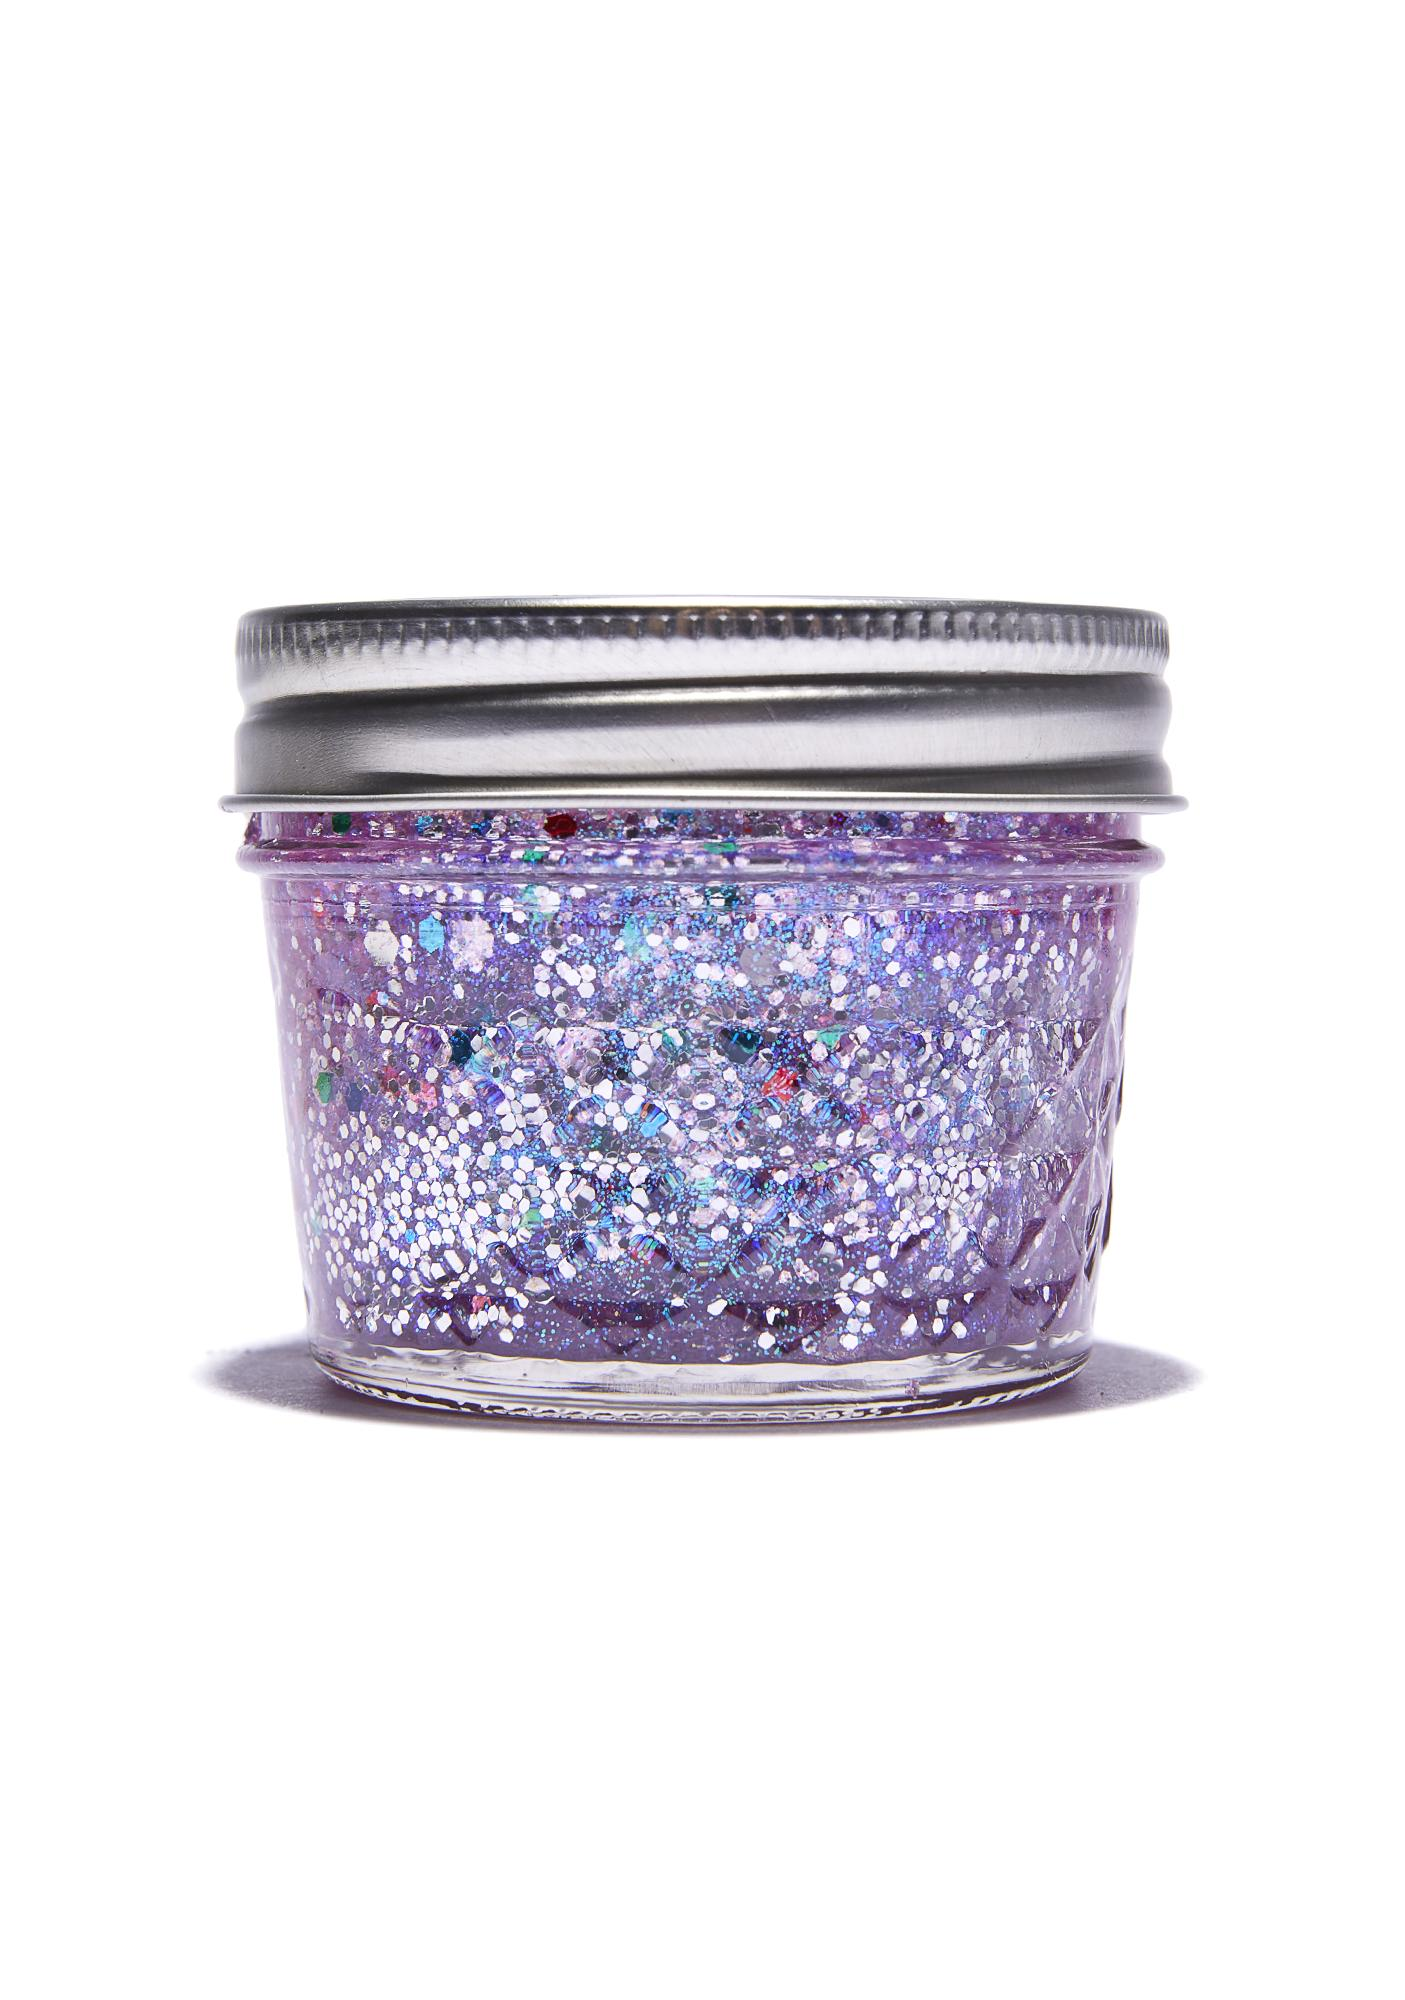 TrashCosmetics Unicorn Icing Glitter Gel